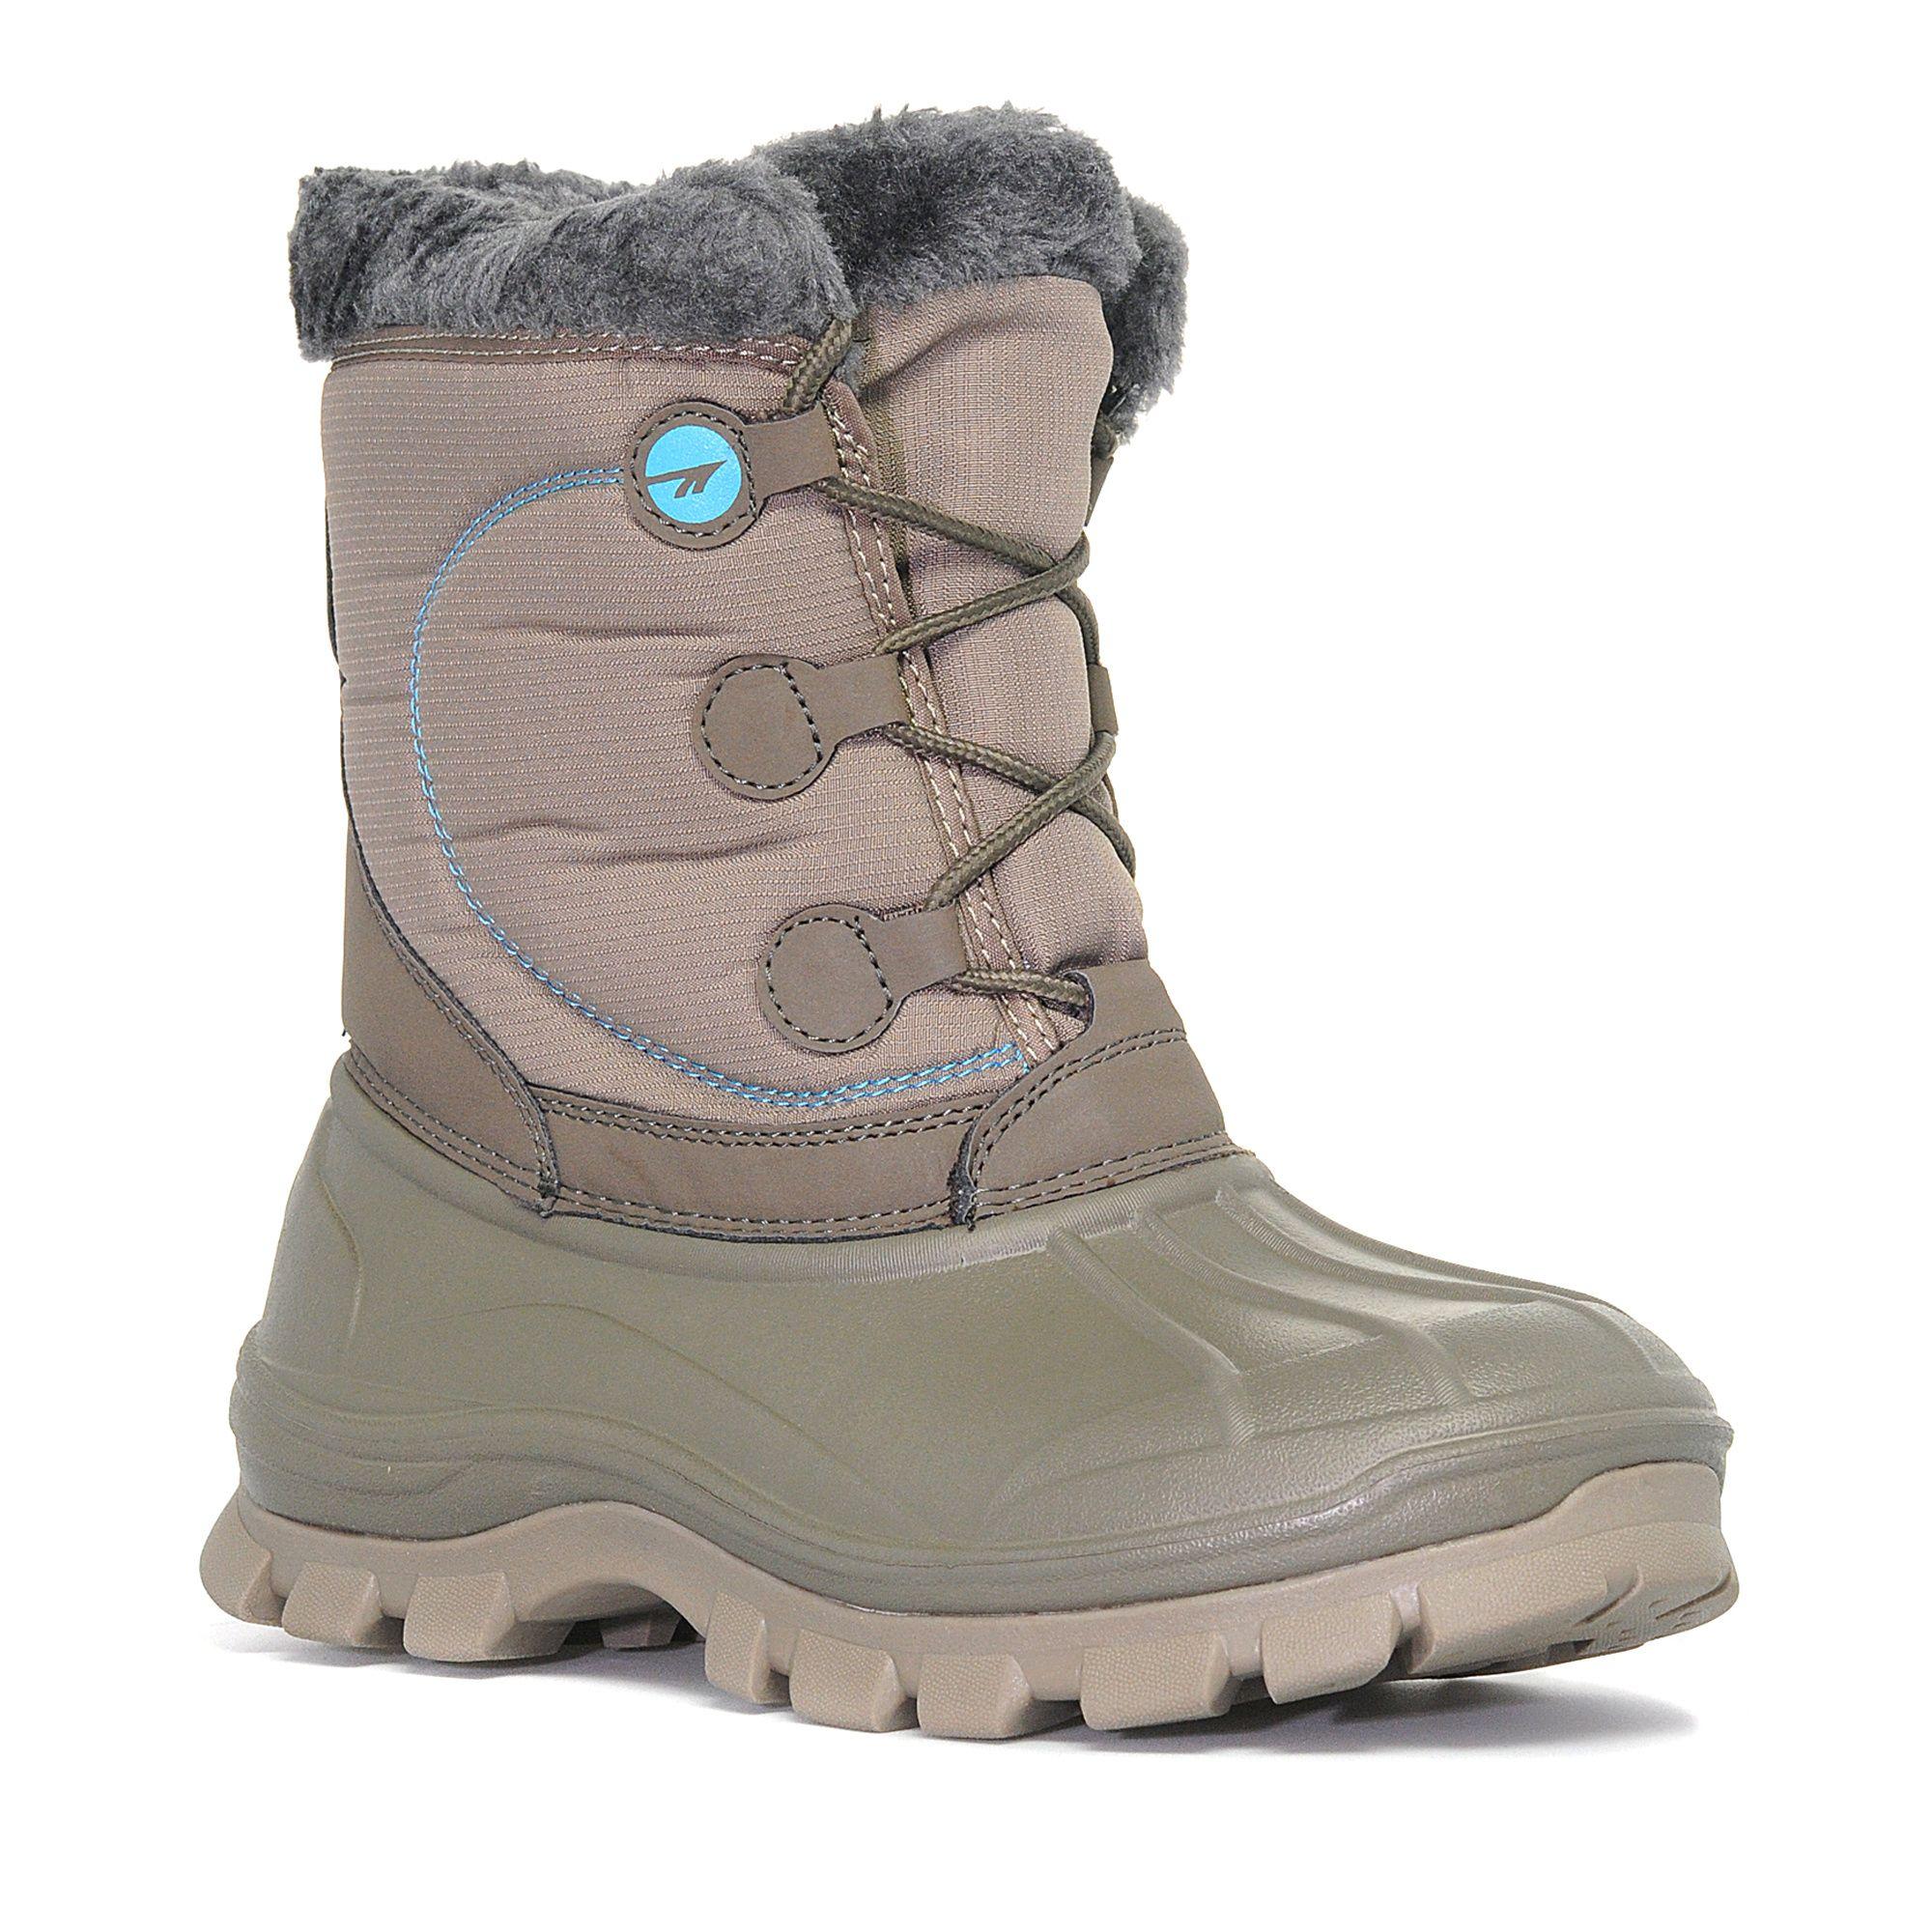 HI TEC Women's Cornice Snow Boots